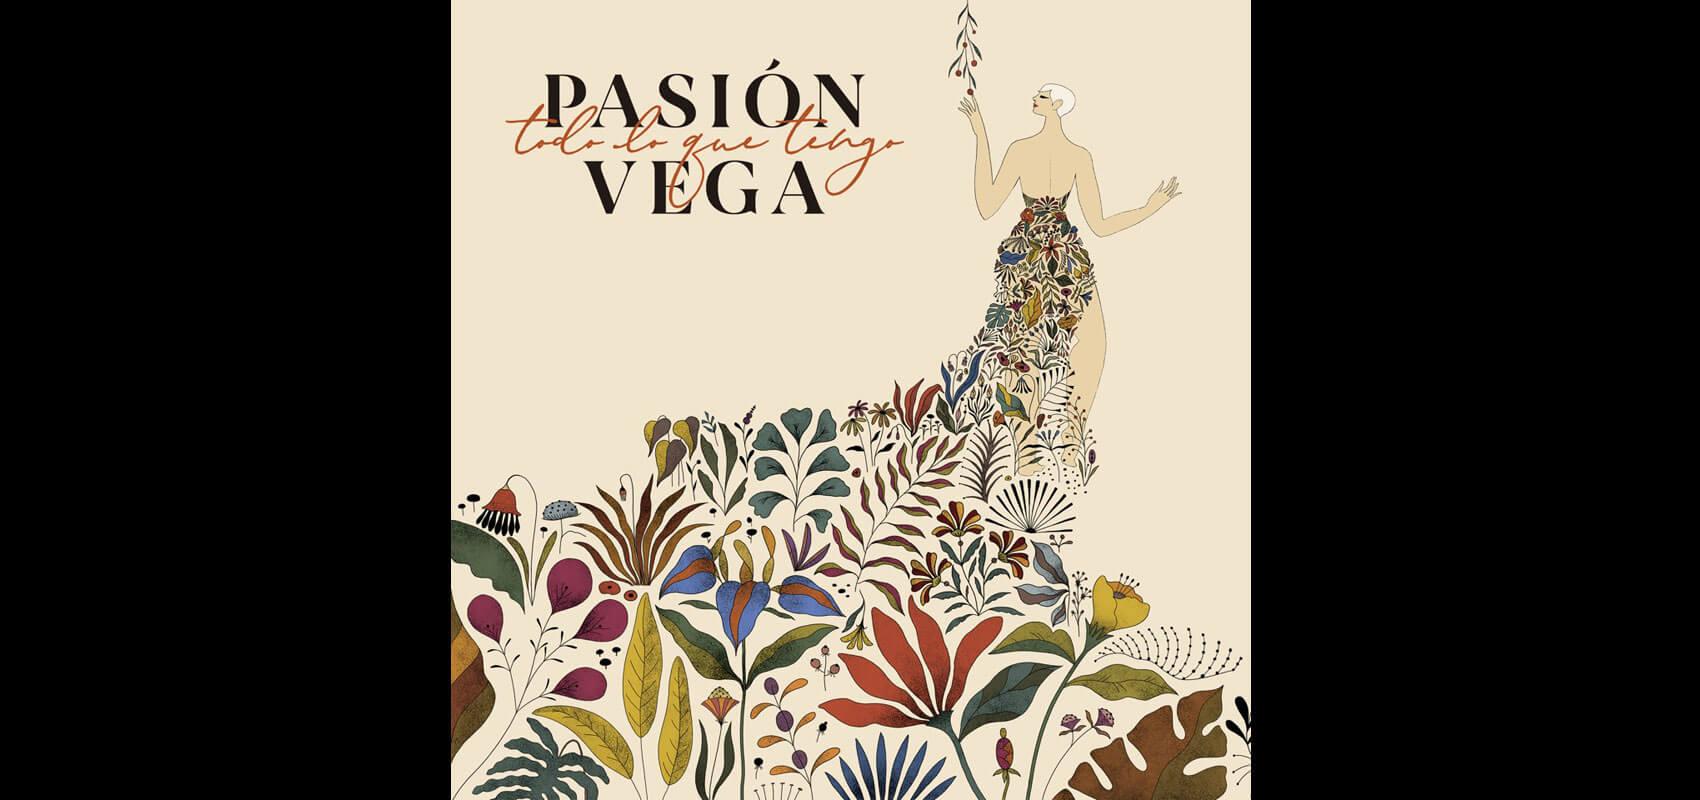 Pasión Vega: todo lo que tengo